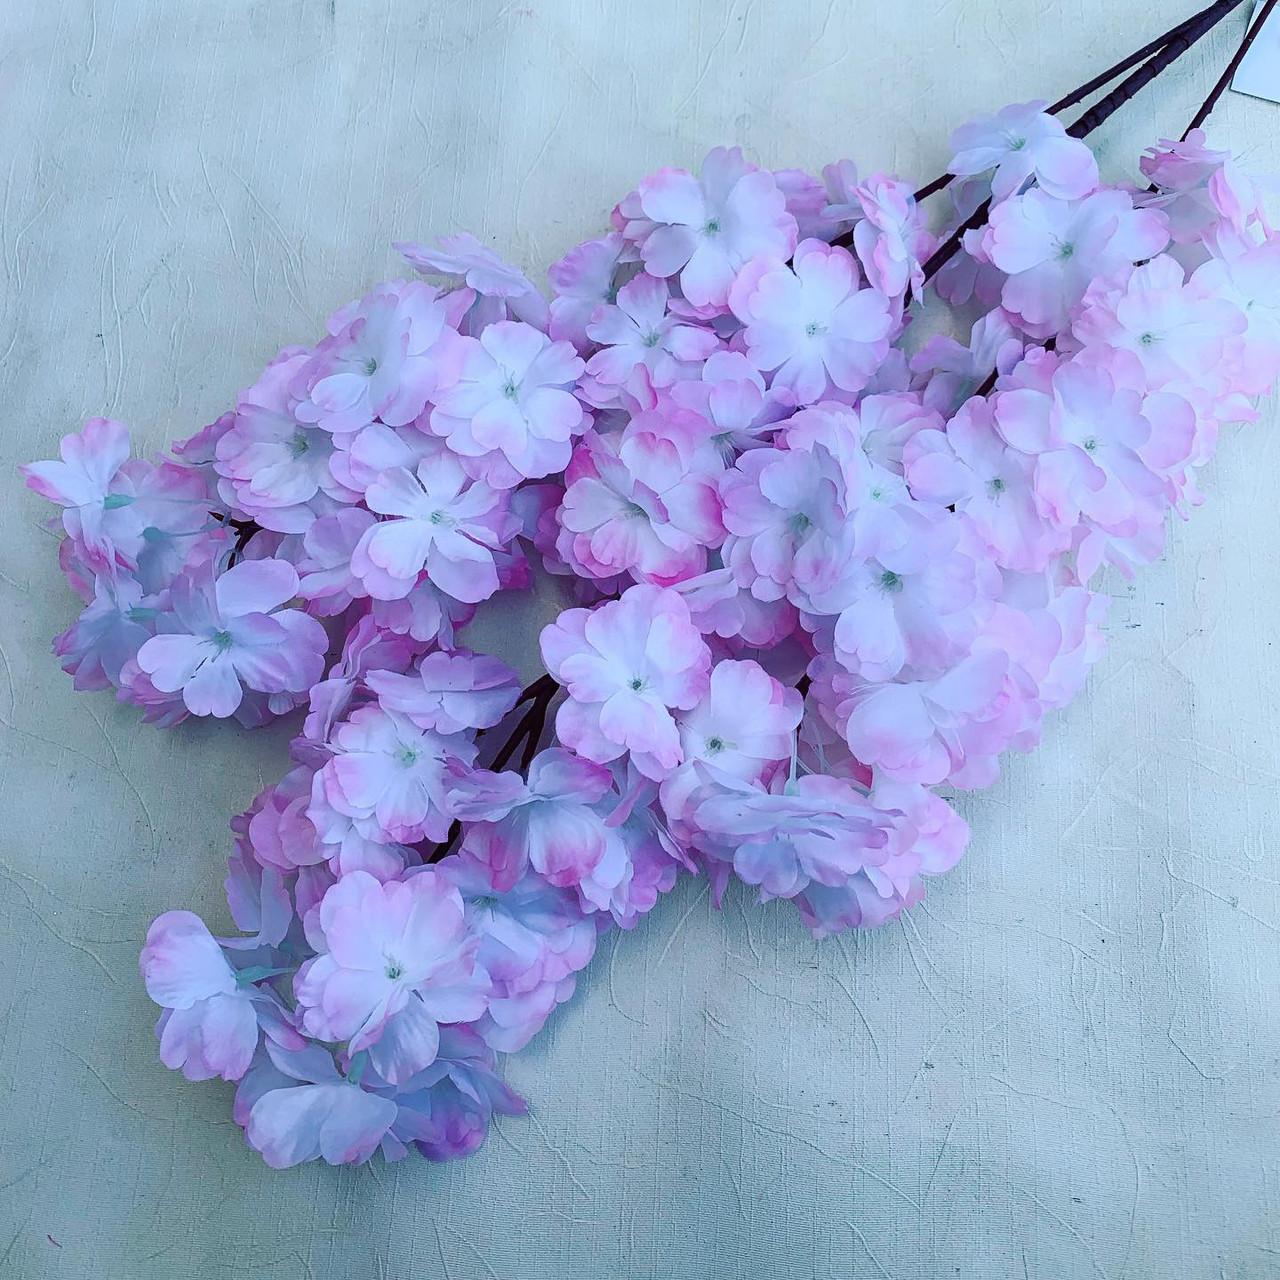 Сакура Декоративная бело-розовая.